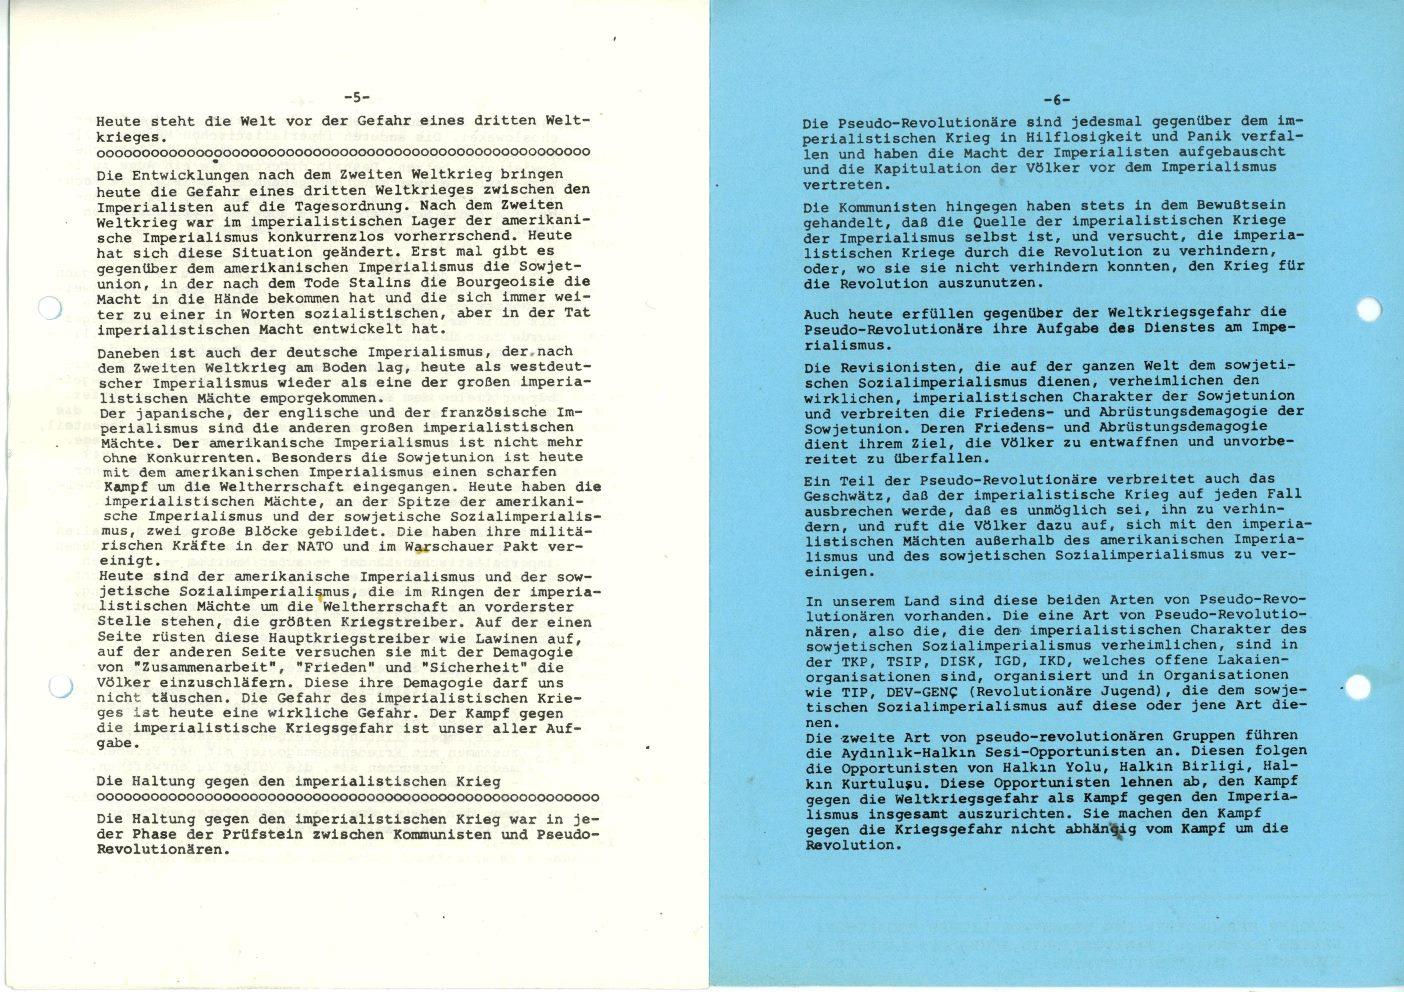 TKPML_1977_03_04